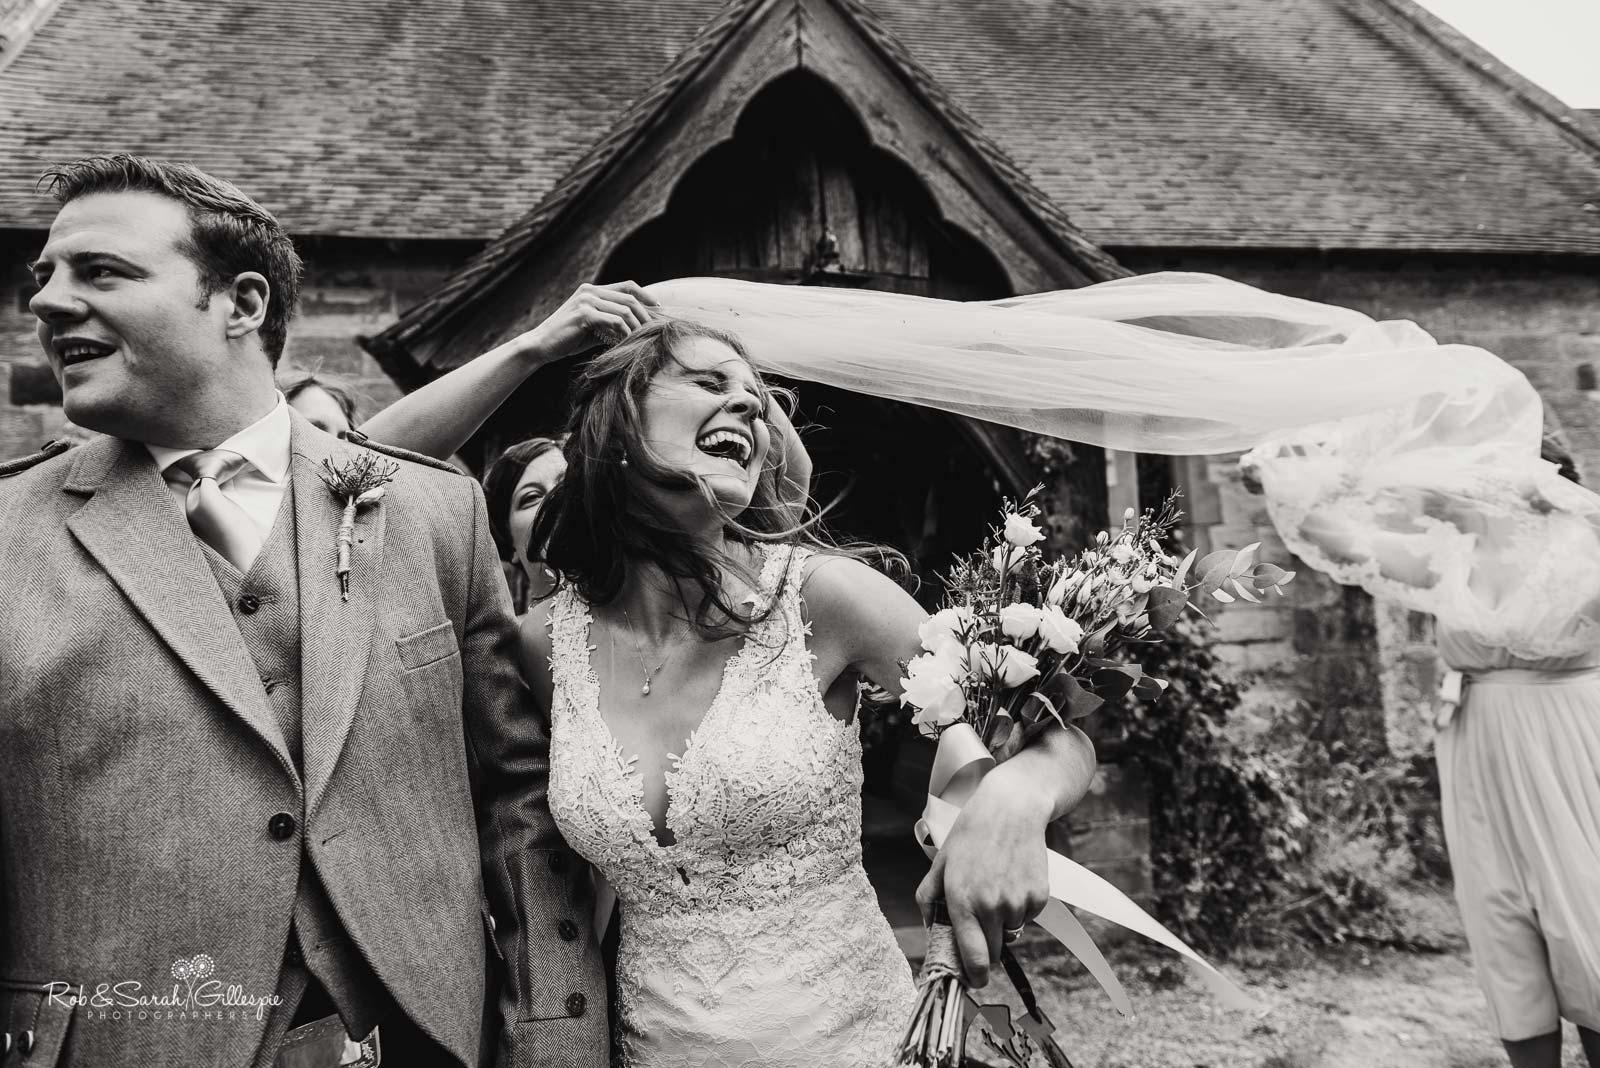 Documentary wedding photographers at St Giles church Packwood